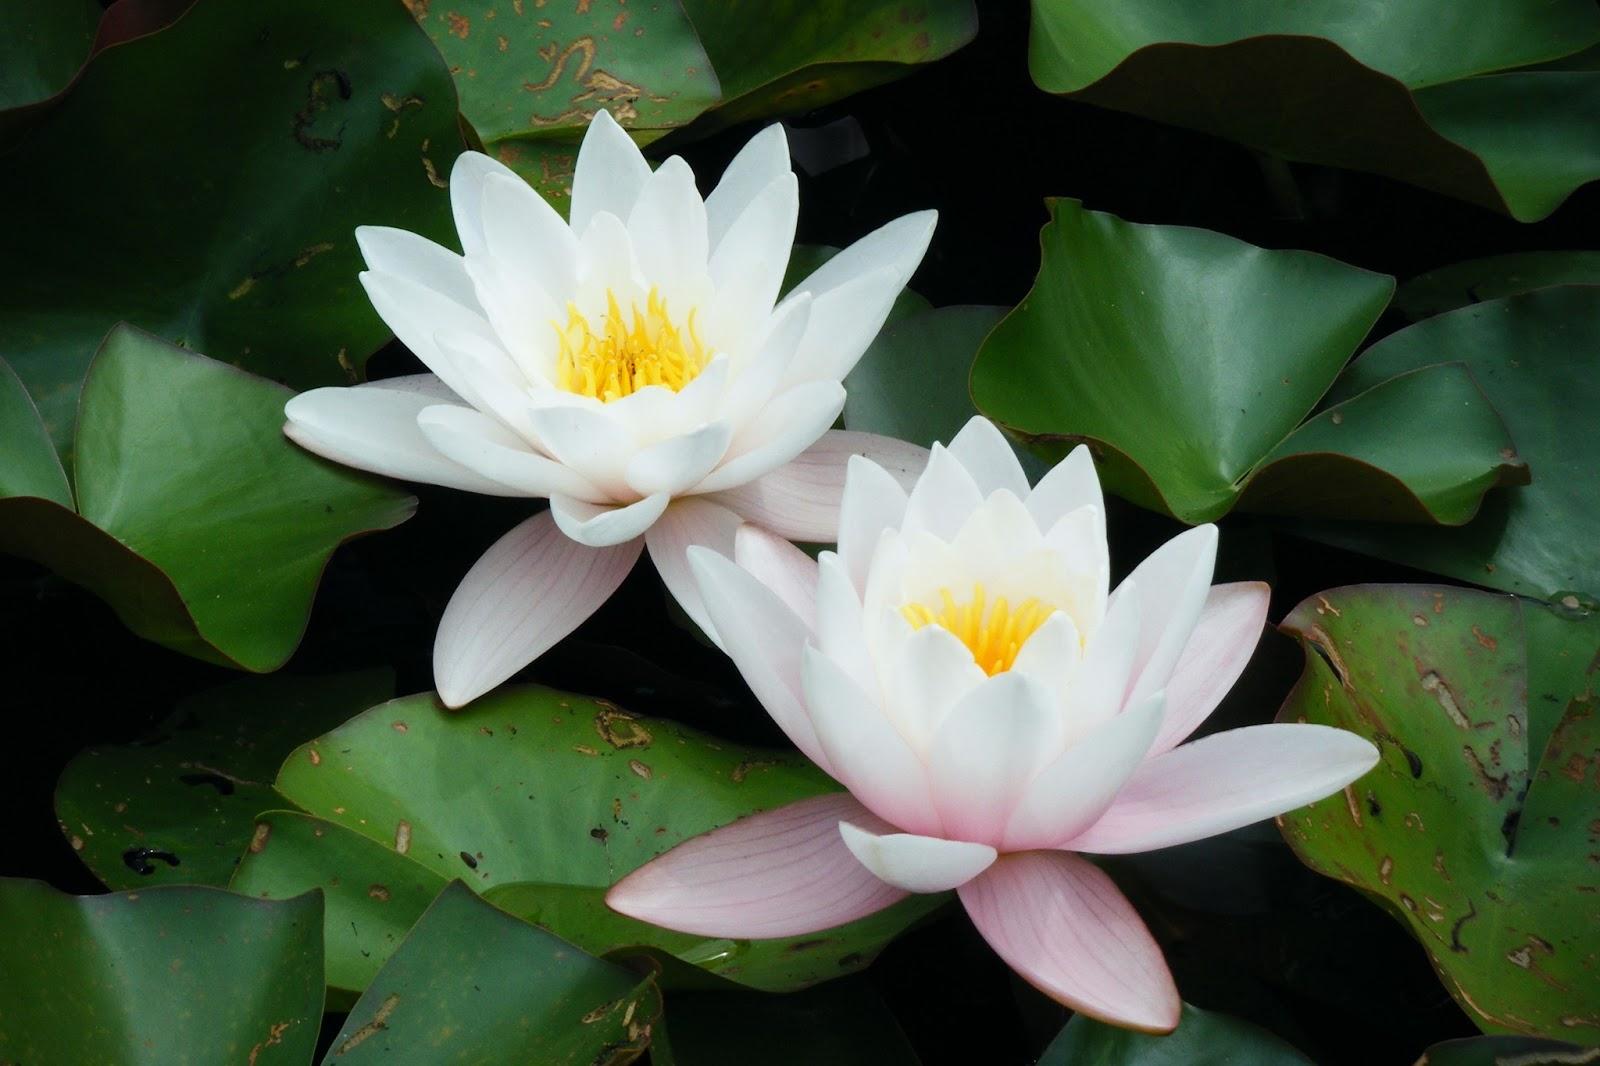 Lotus Flower Hd Wallpapers Hd Wallpapers High